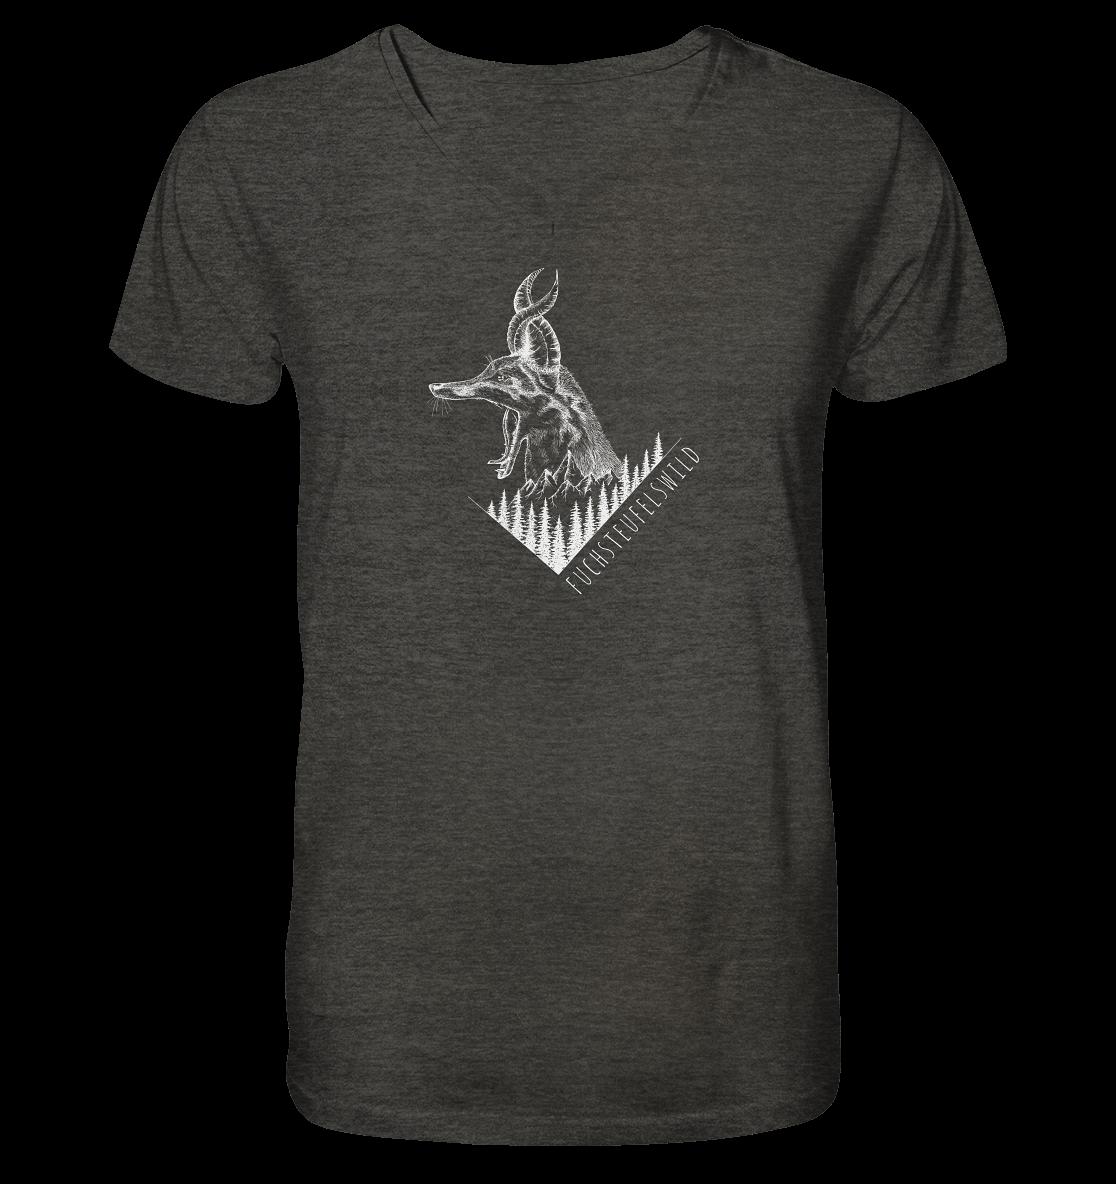 front-mens-organic-v-neck-shirt-252625-1116x-20.png